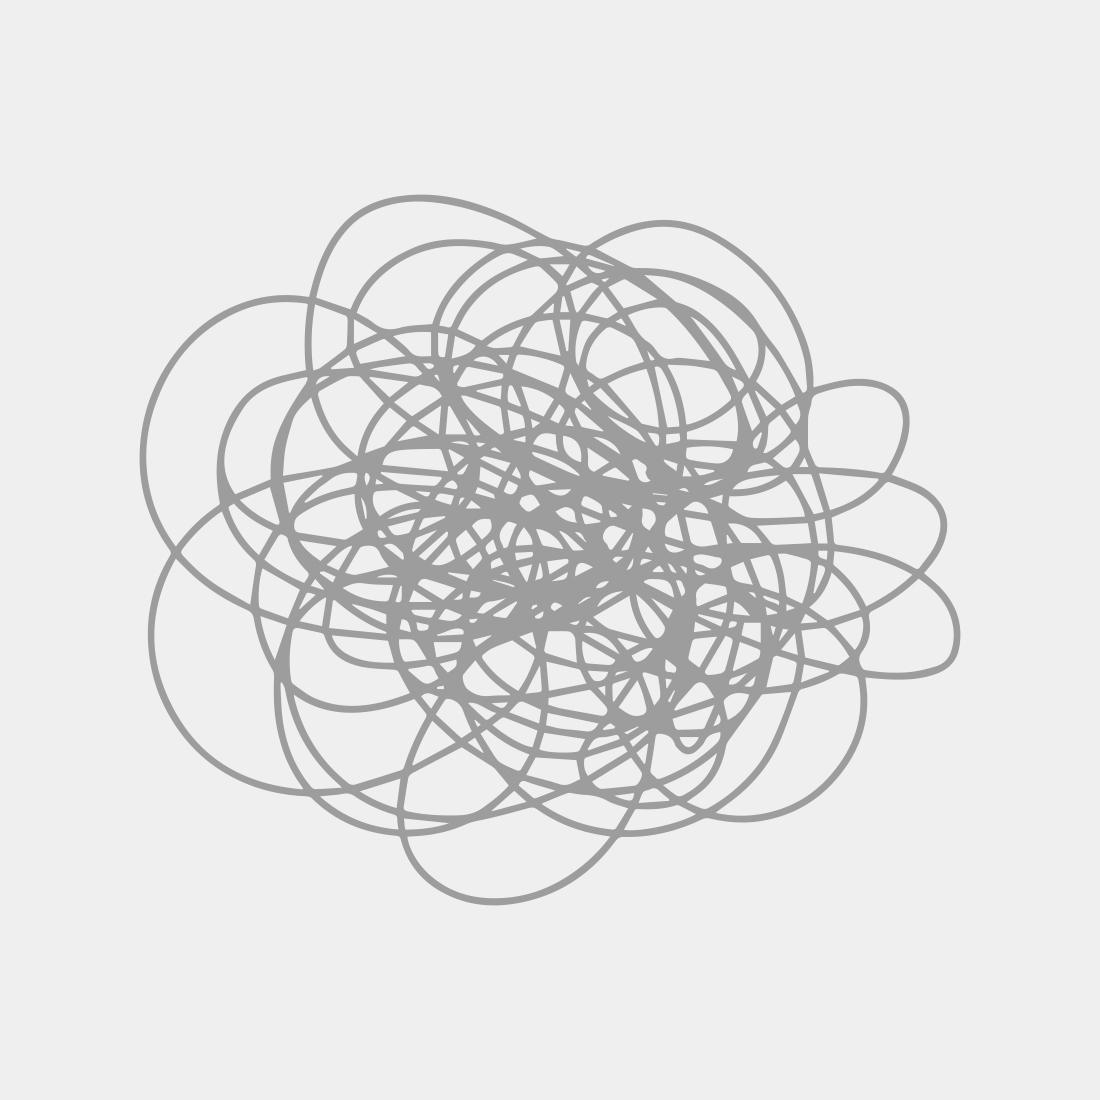 Albert Irvin OBE RA Untitled opus w.19 (framed)